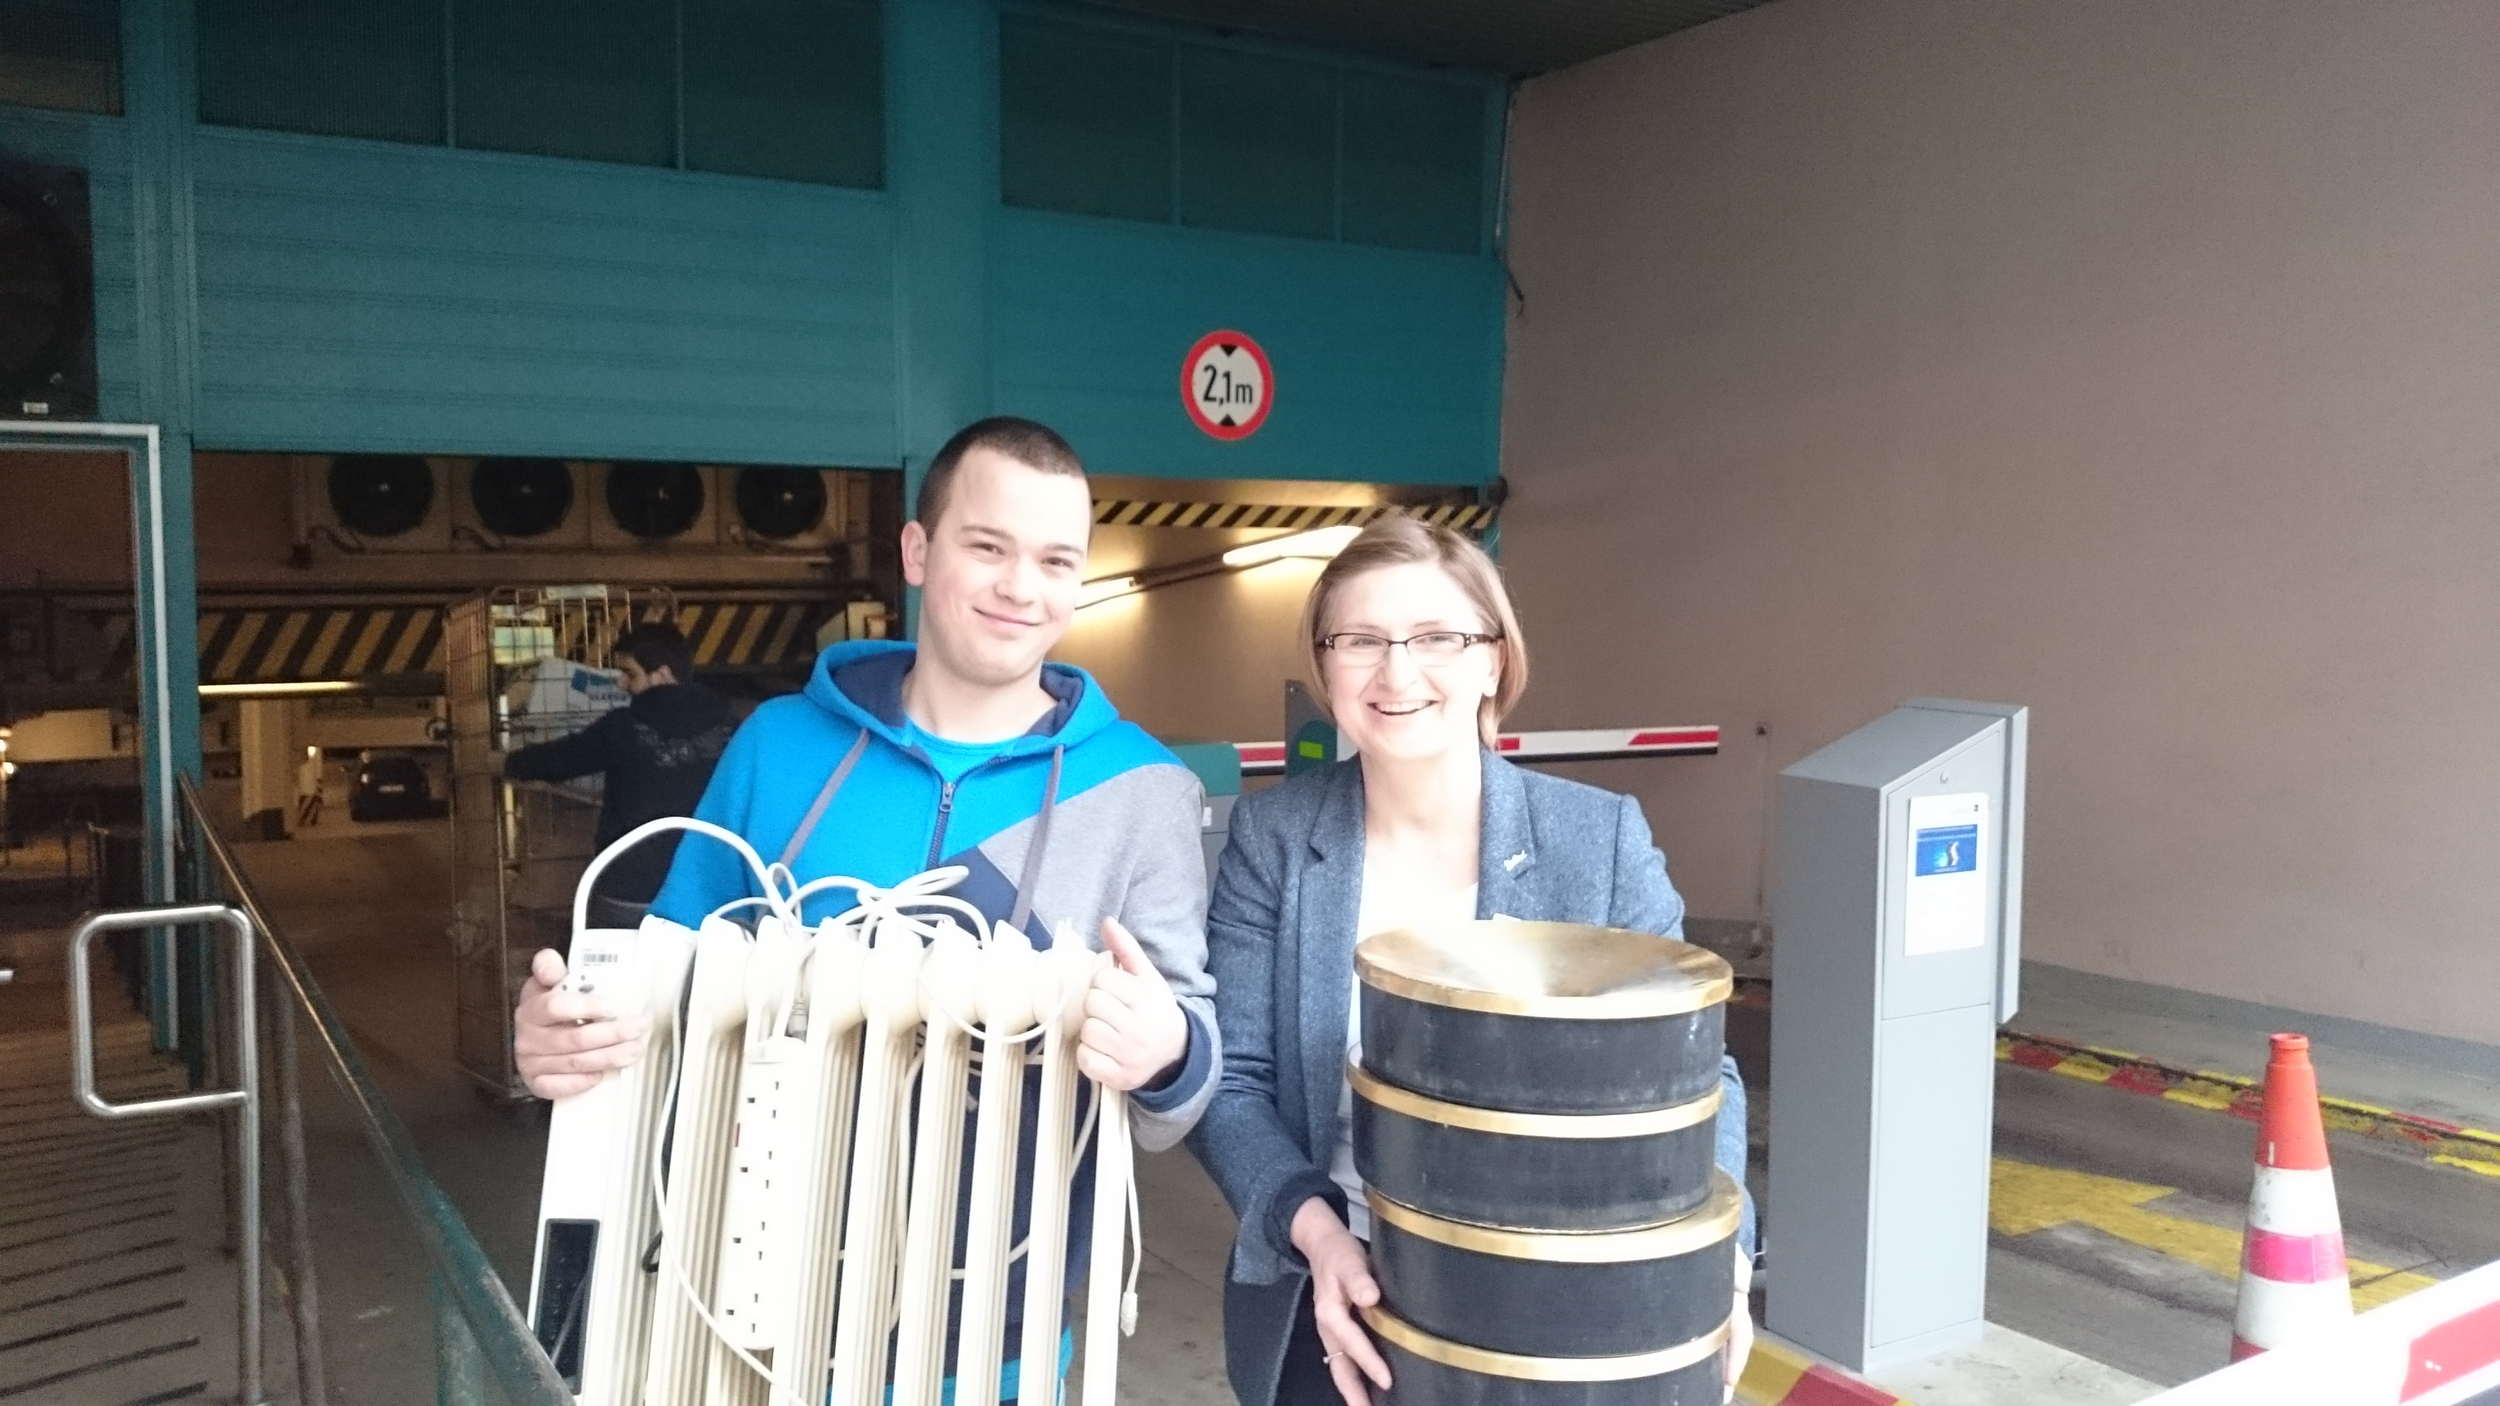 Staff of Radisson Blu Sobieski Hotel, Warsaw donates old electrical equipment to school for blind children in Warsaw.